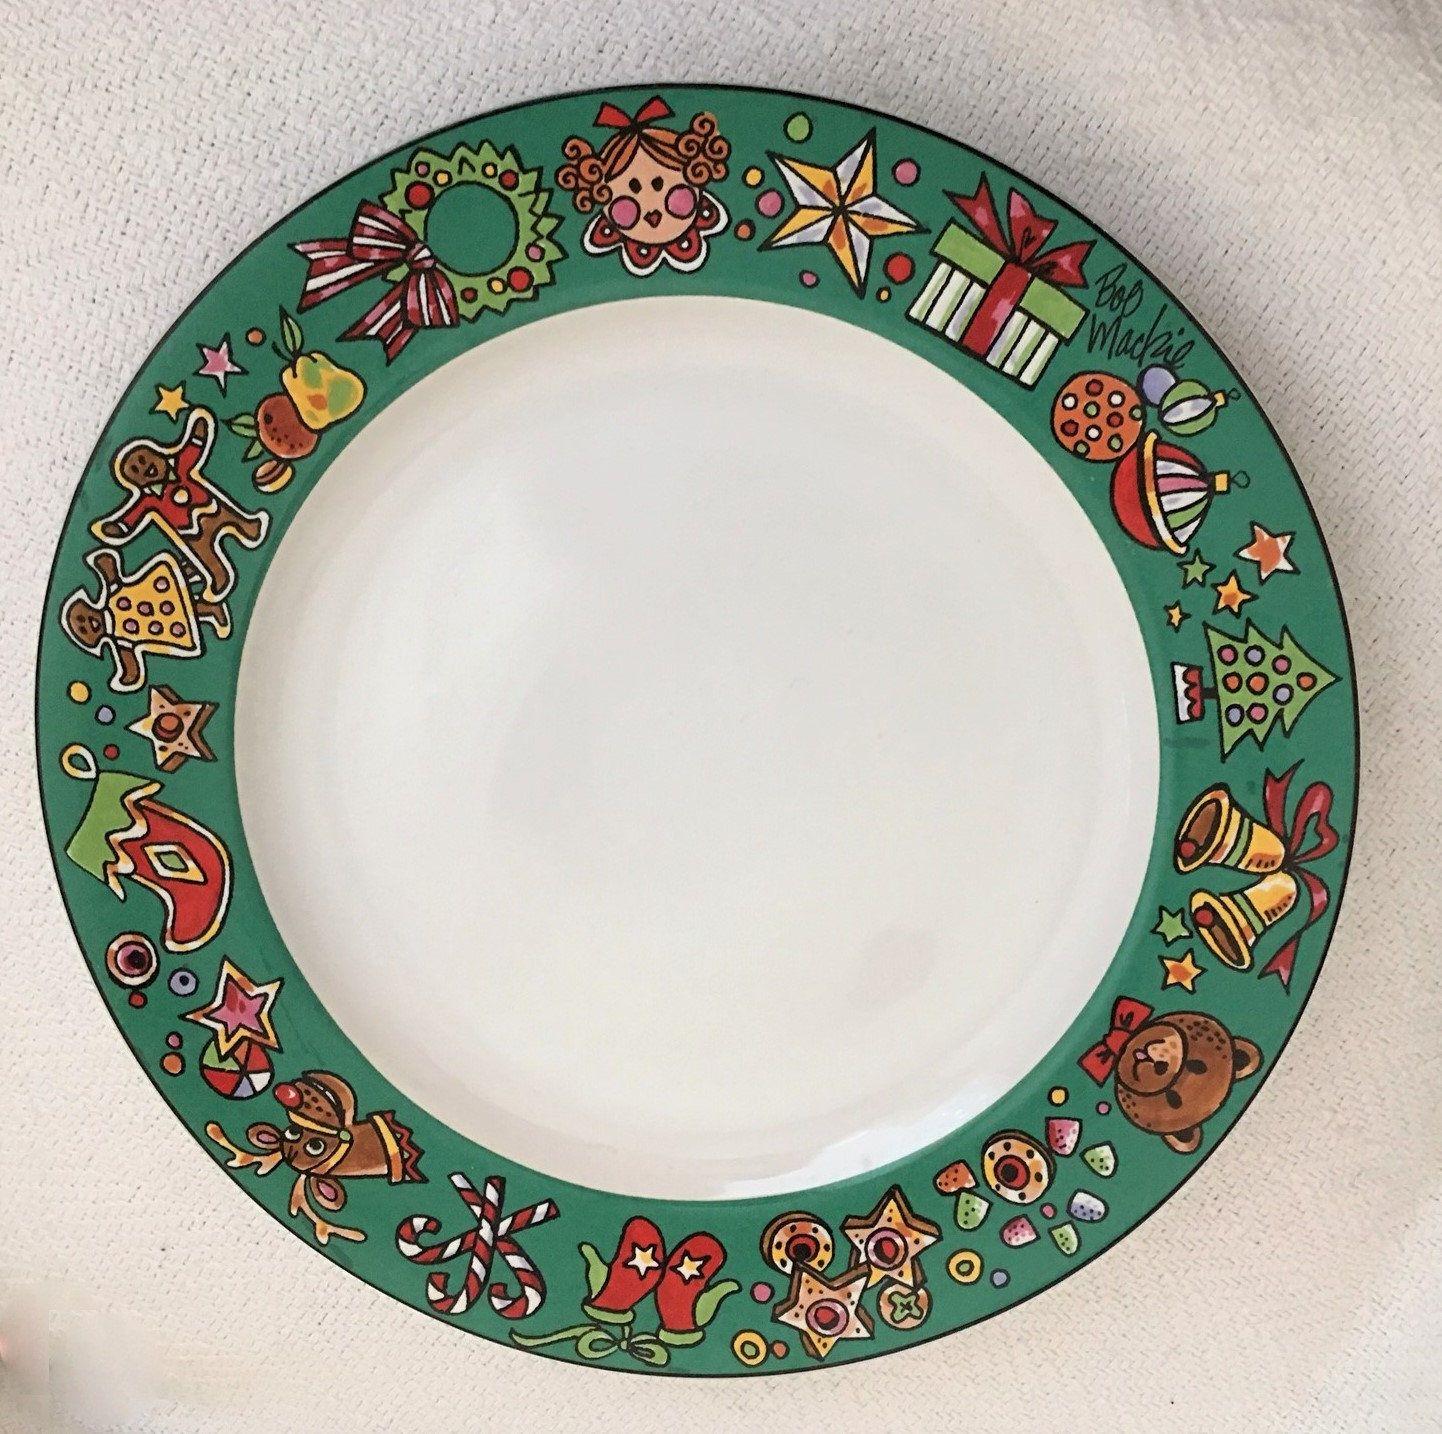 Bob Mackie Designer Santa S Party Christmas Plate Sakura New York Christmas Plates Cookies For Santa Plate Classic Christmas